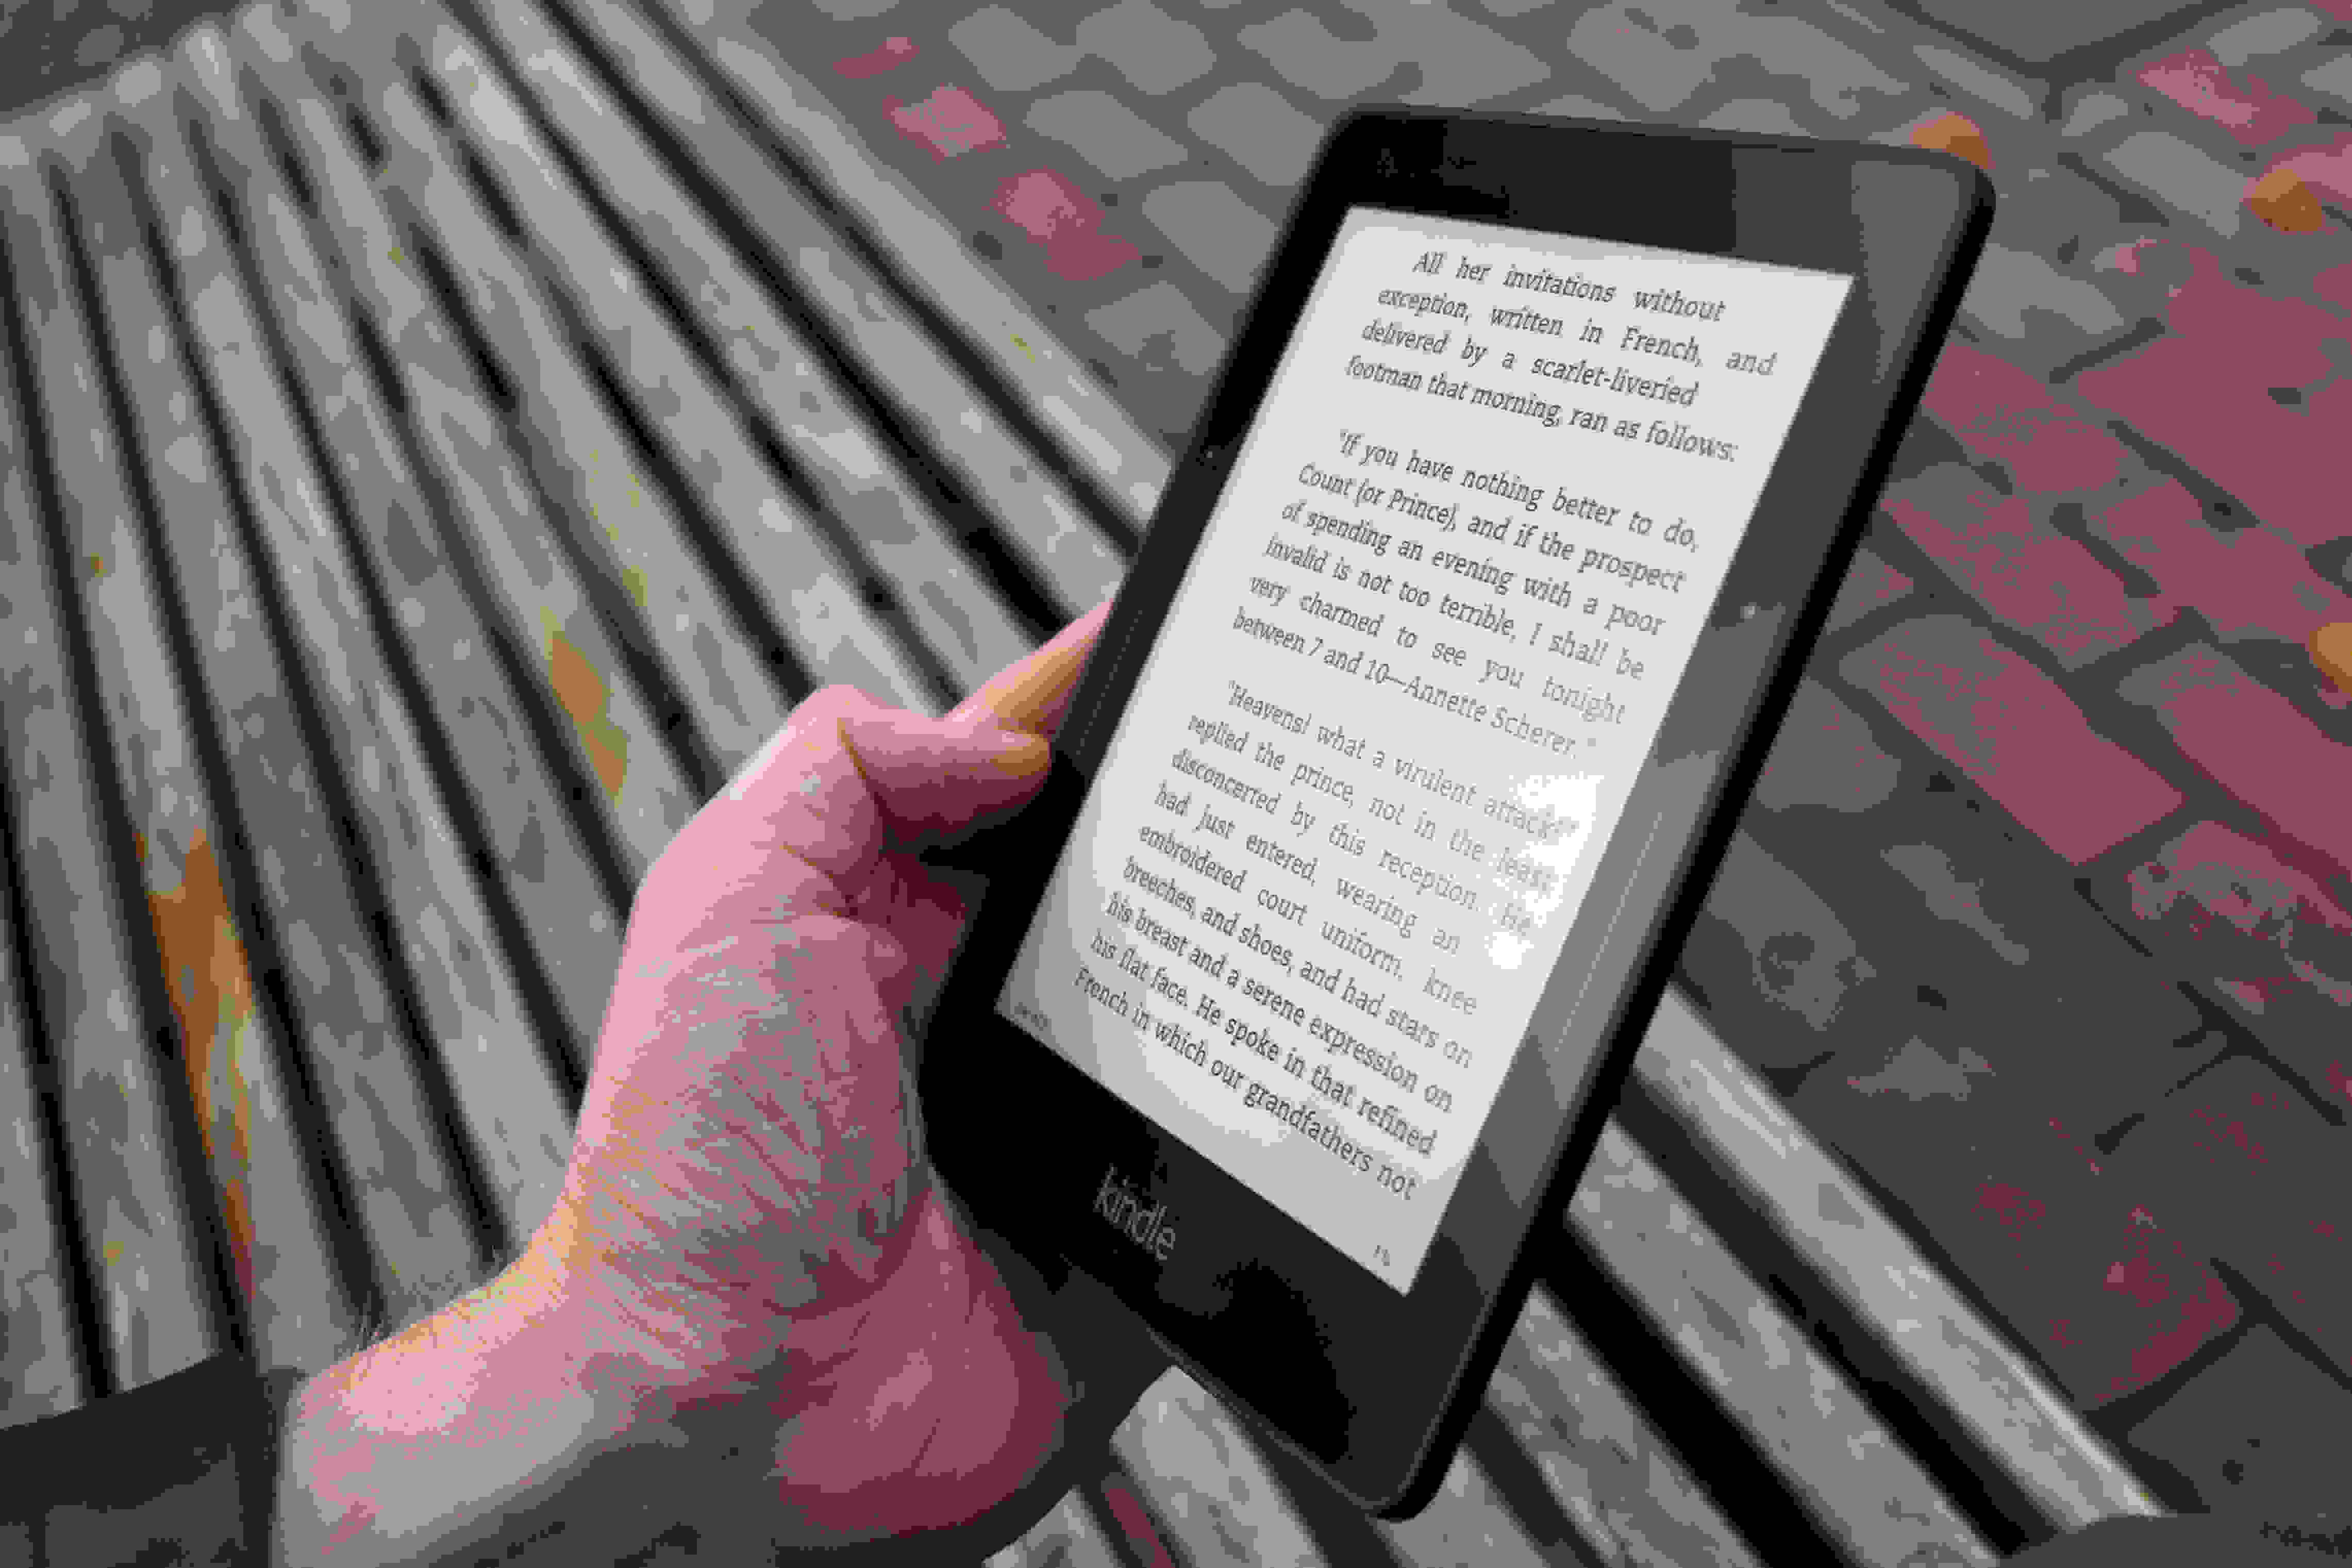 A photo of the Amazon Kindle Voyage's reflectivity.